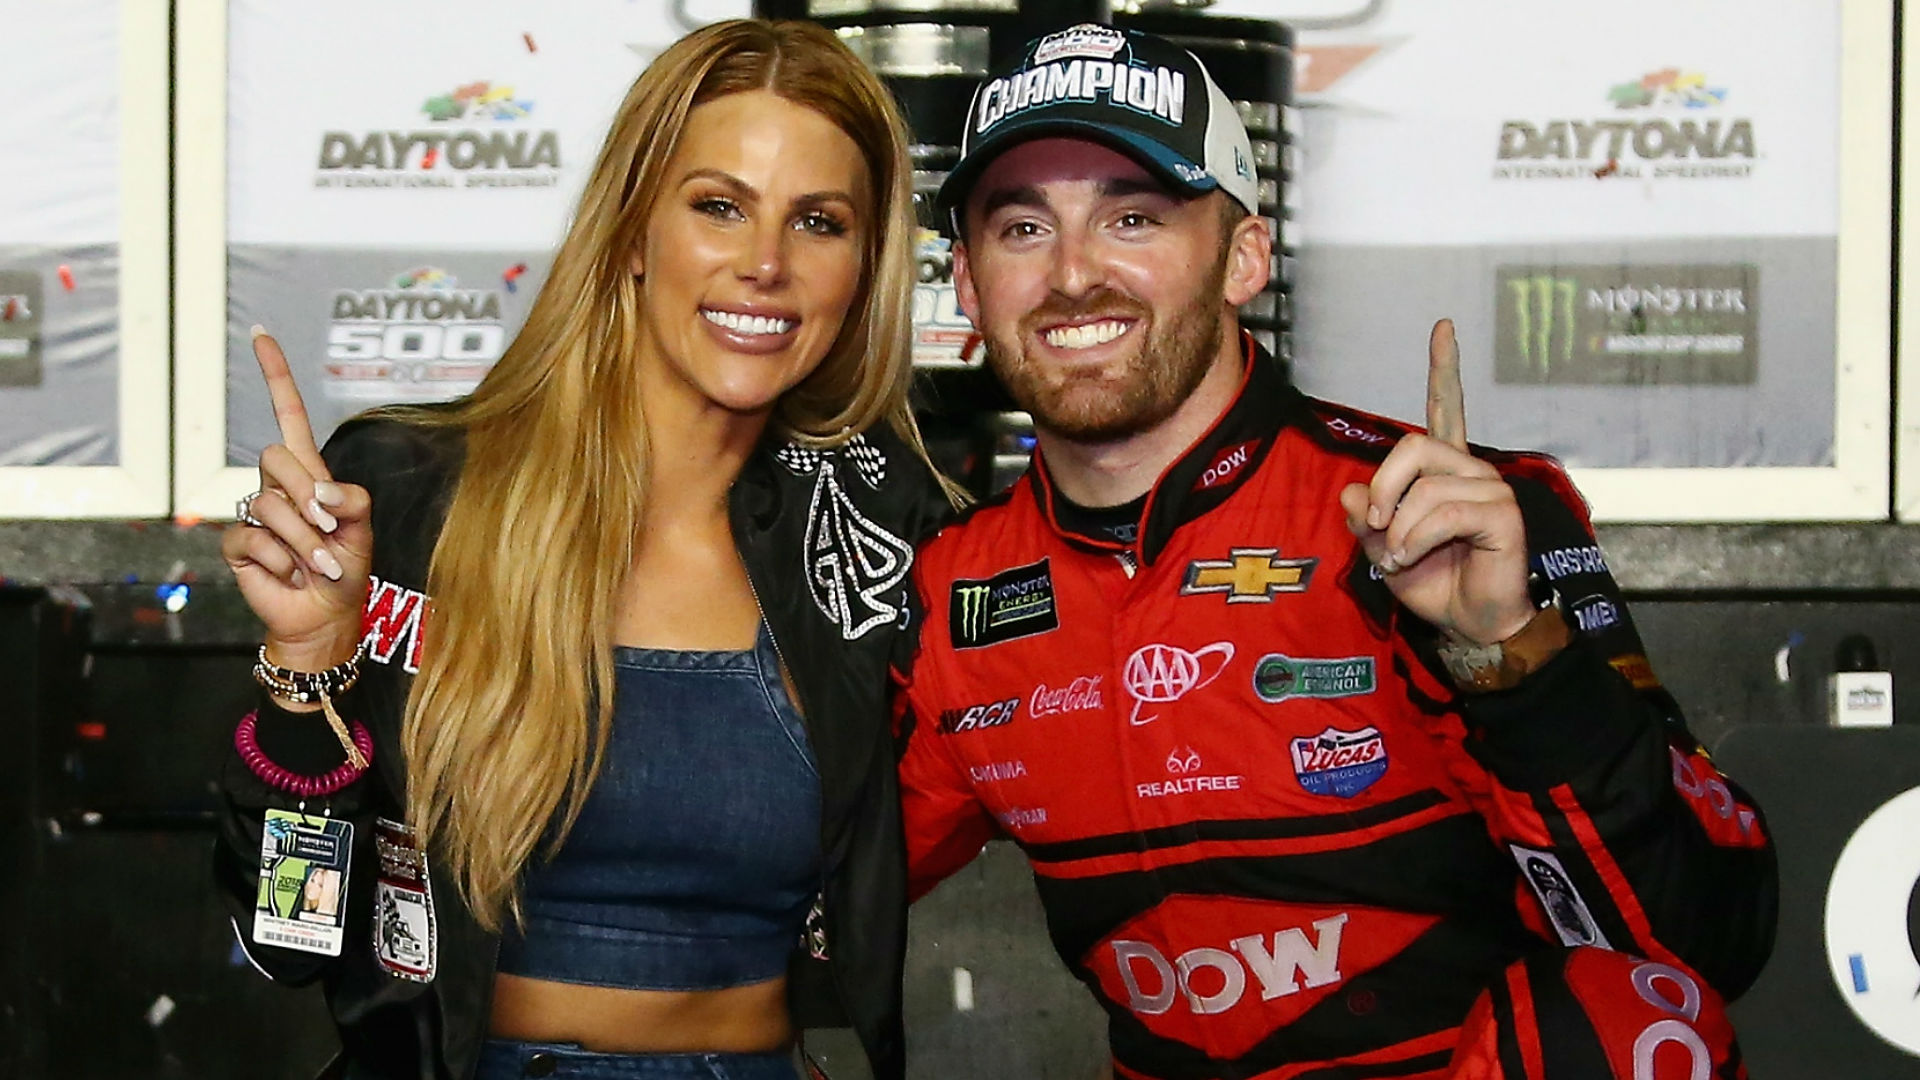 Alex Bowman starts Daytona 500 from pole in No. 88 vehicle